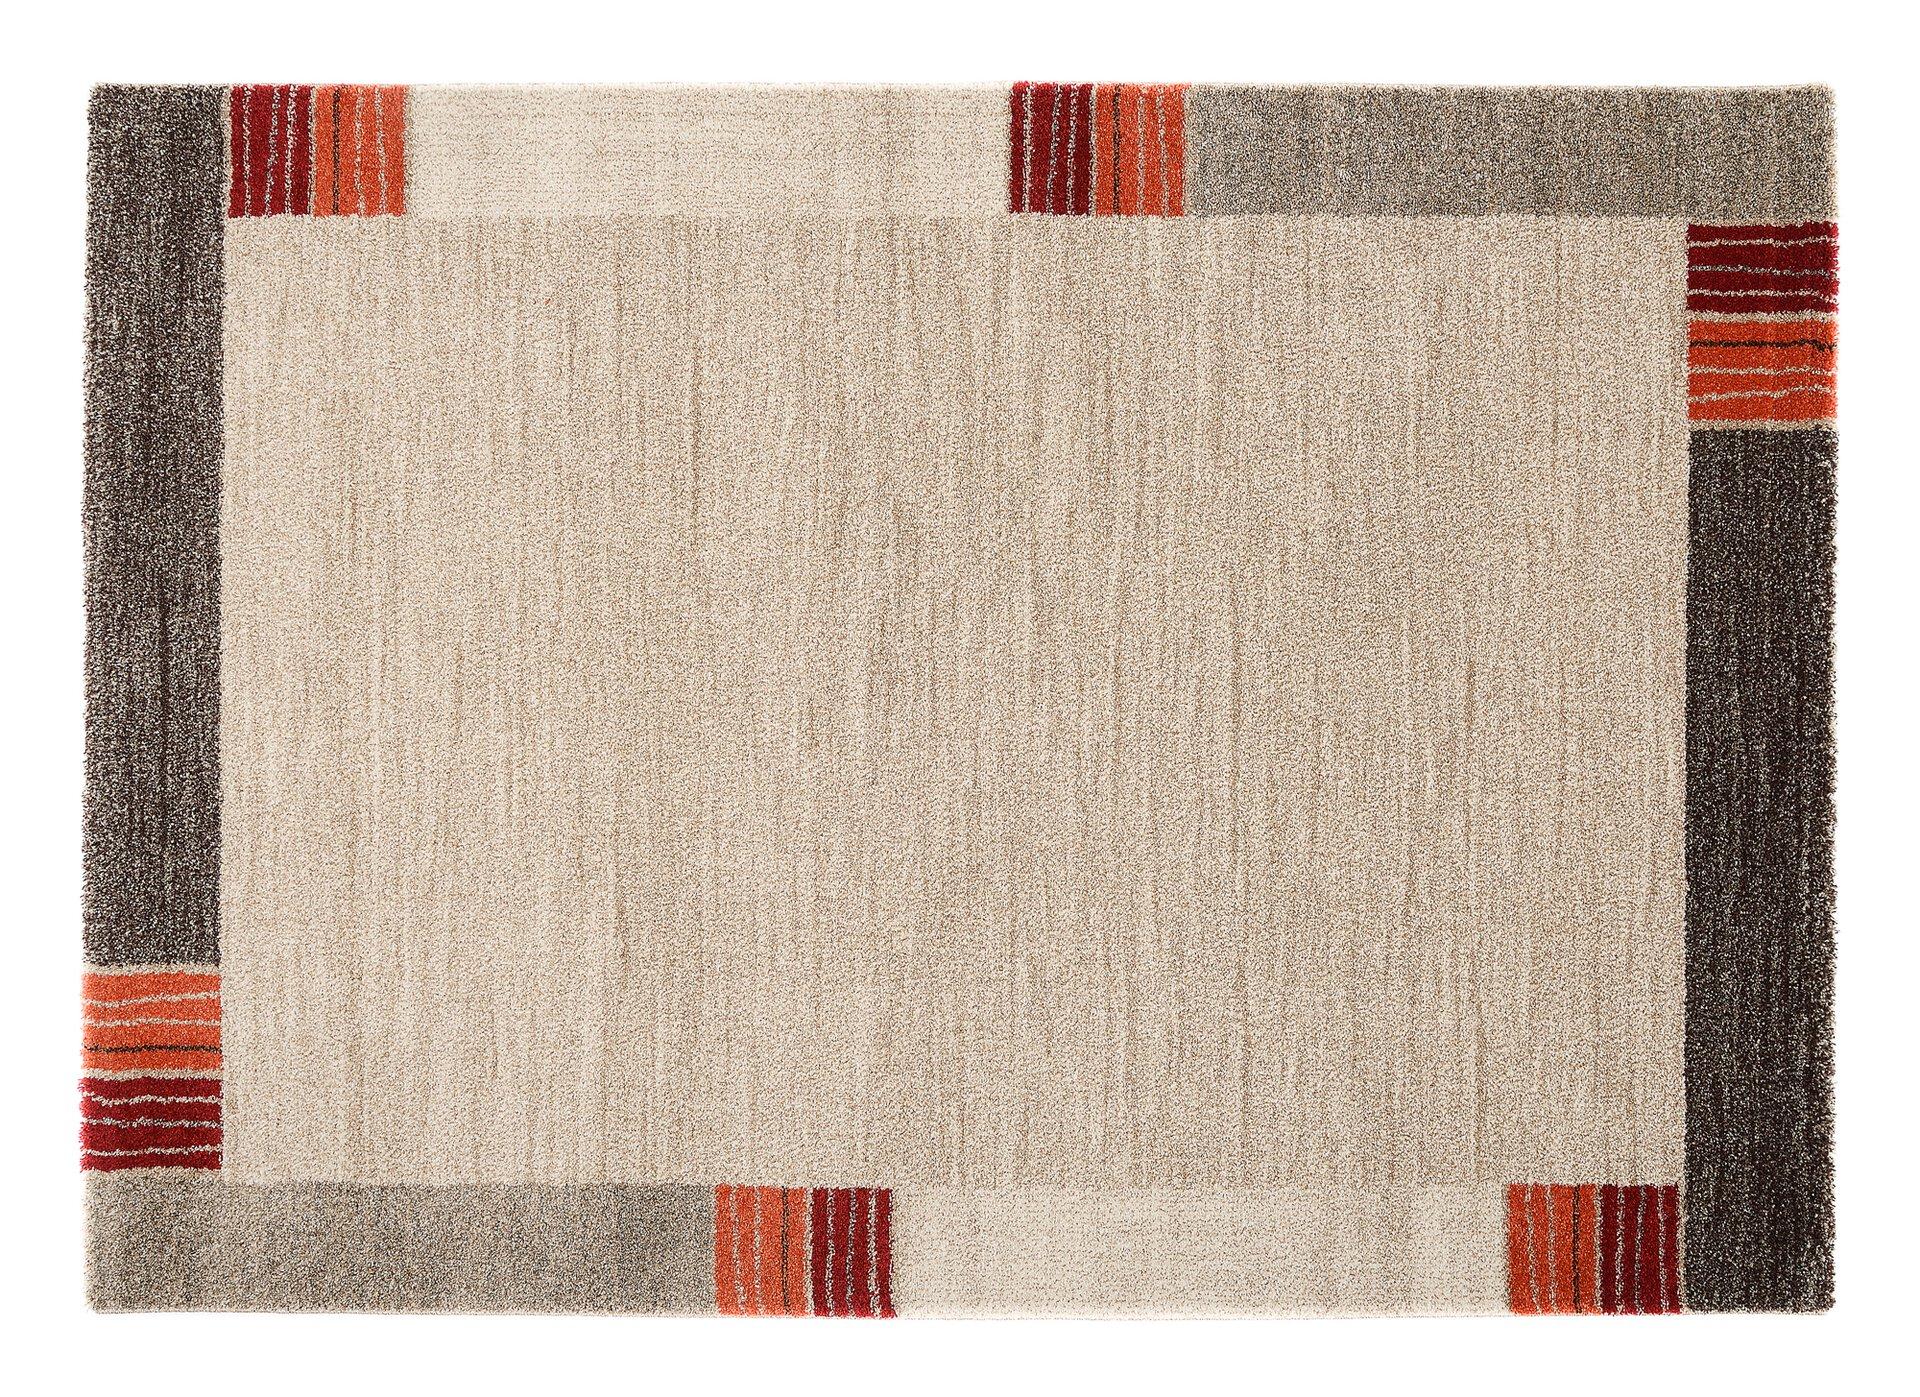 Maschinenwebteppich Castle Flora OCI Textil beige 1 x 2 cm